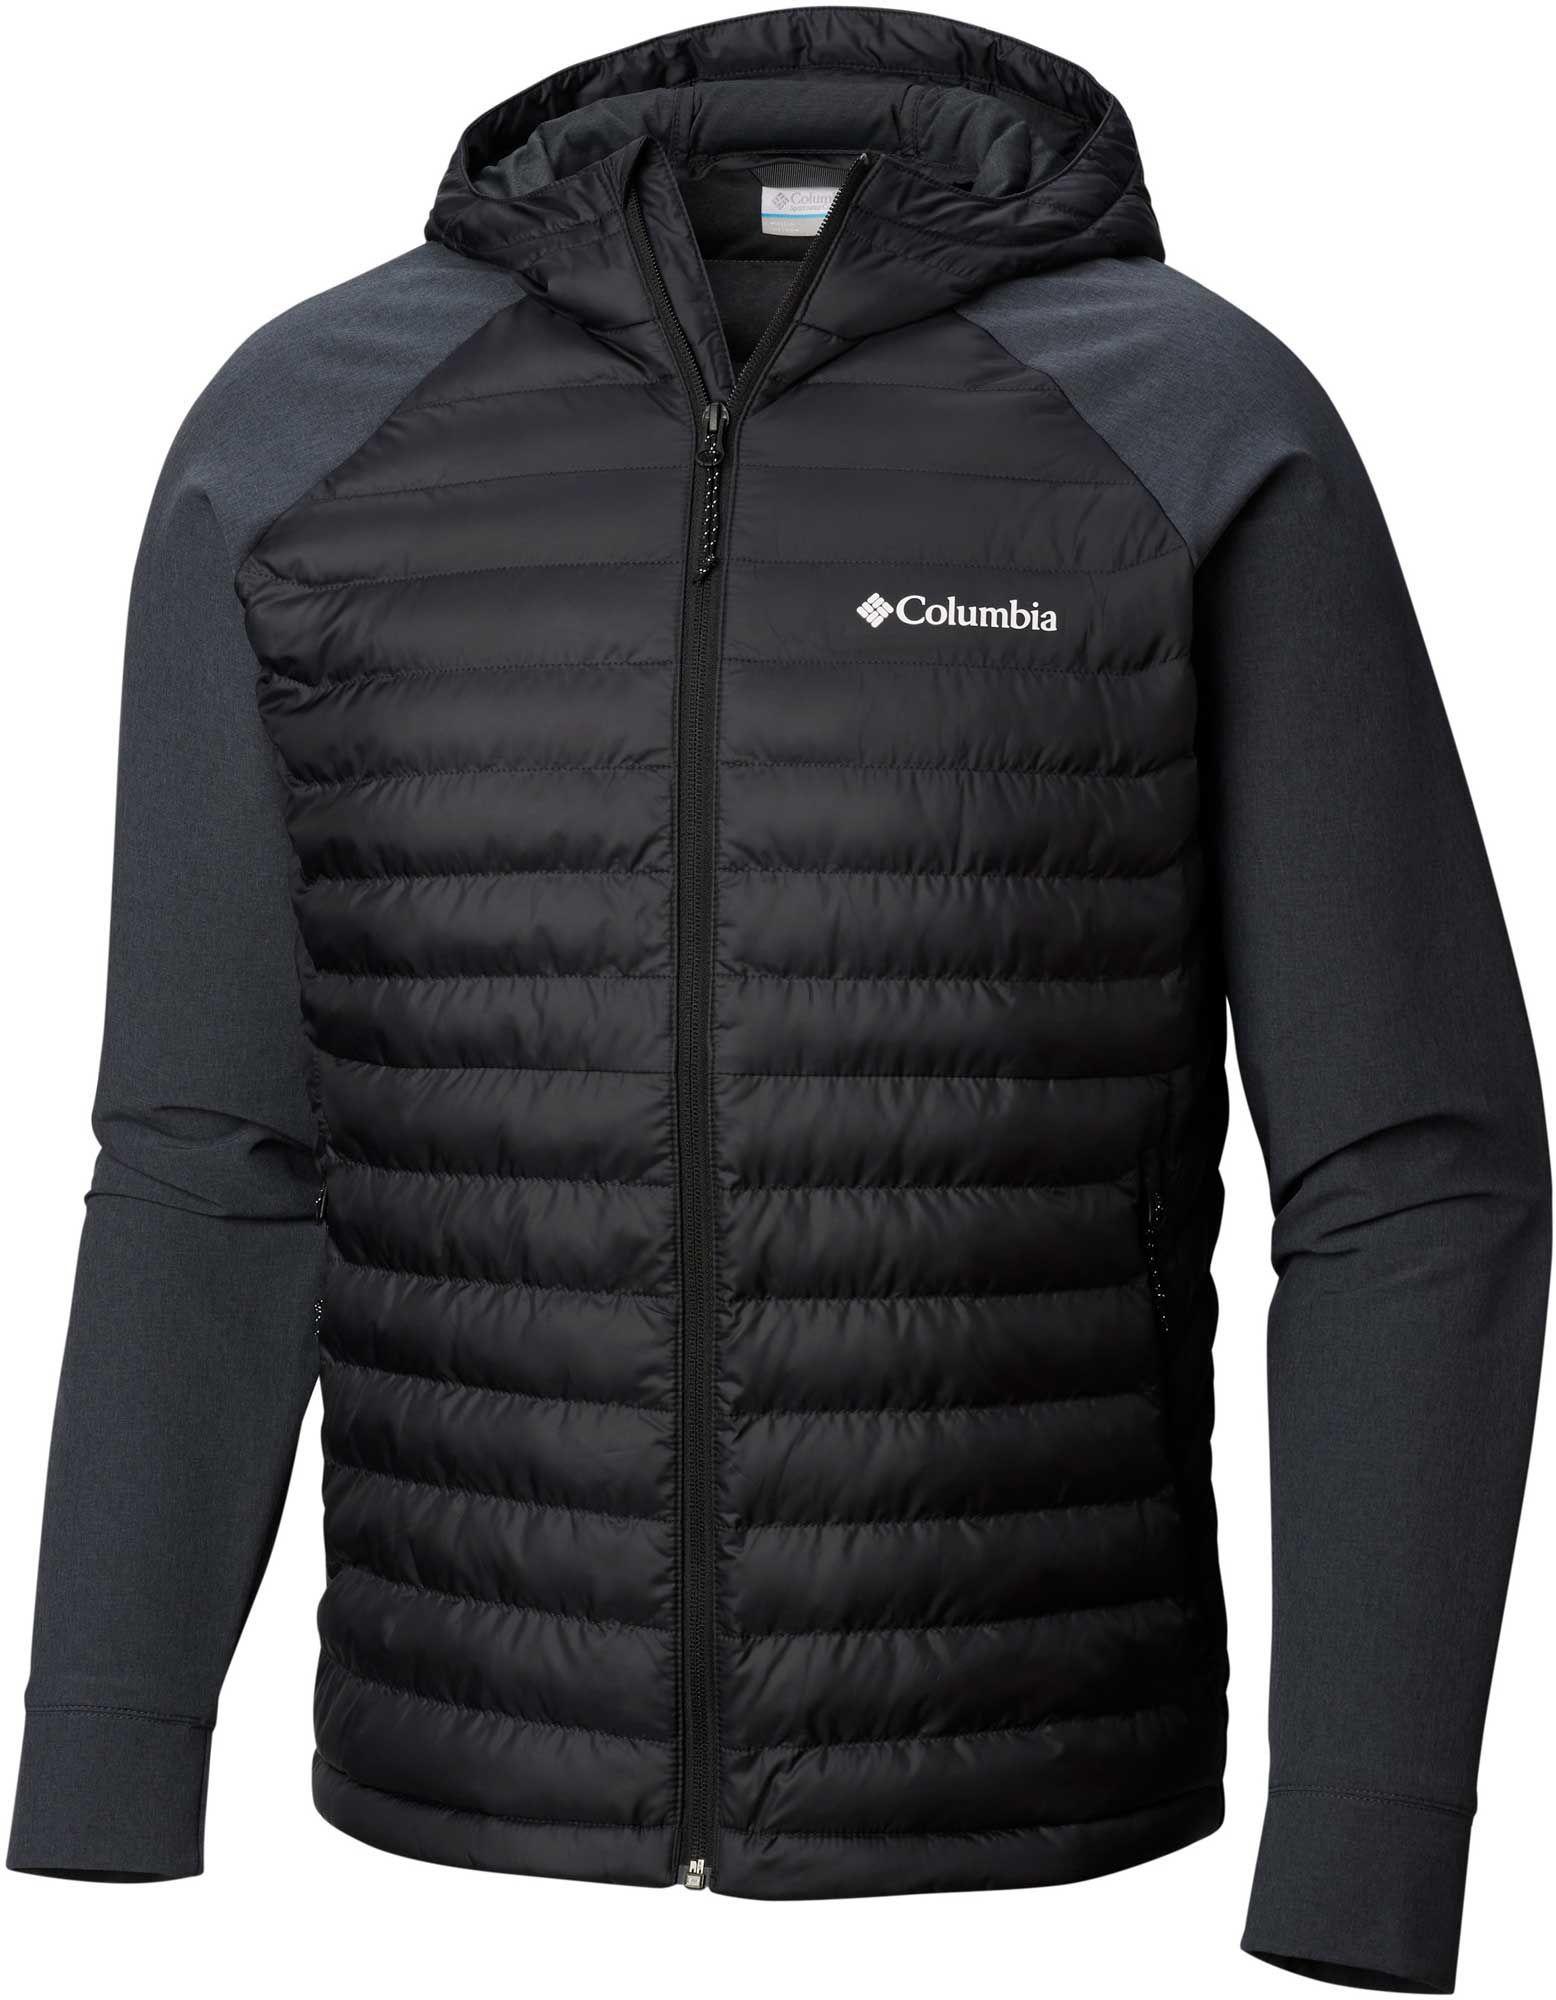 e0e530ce9d0d7 Columbia Men's Rogue Explorer Hybrid Jacket in 2019 | Products ...